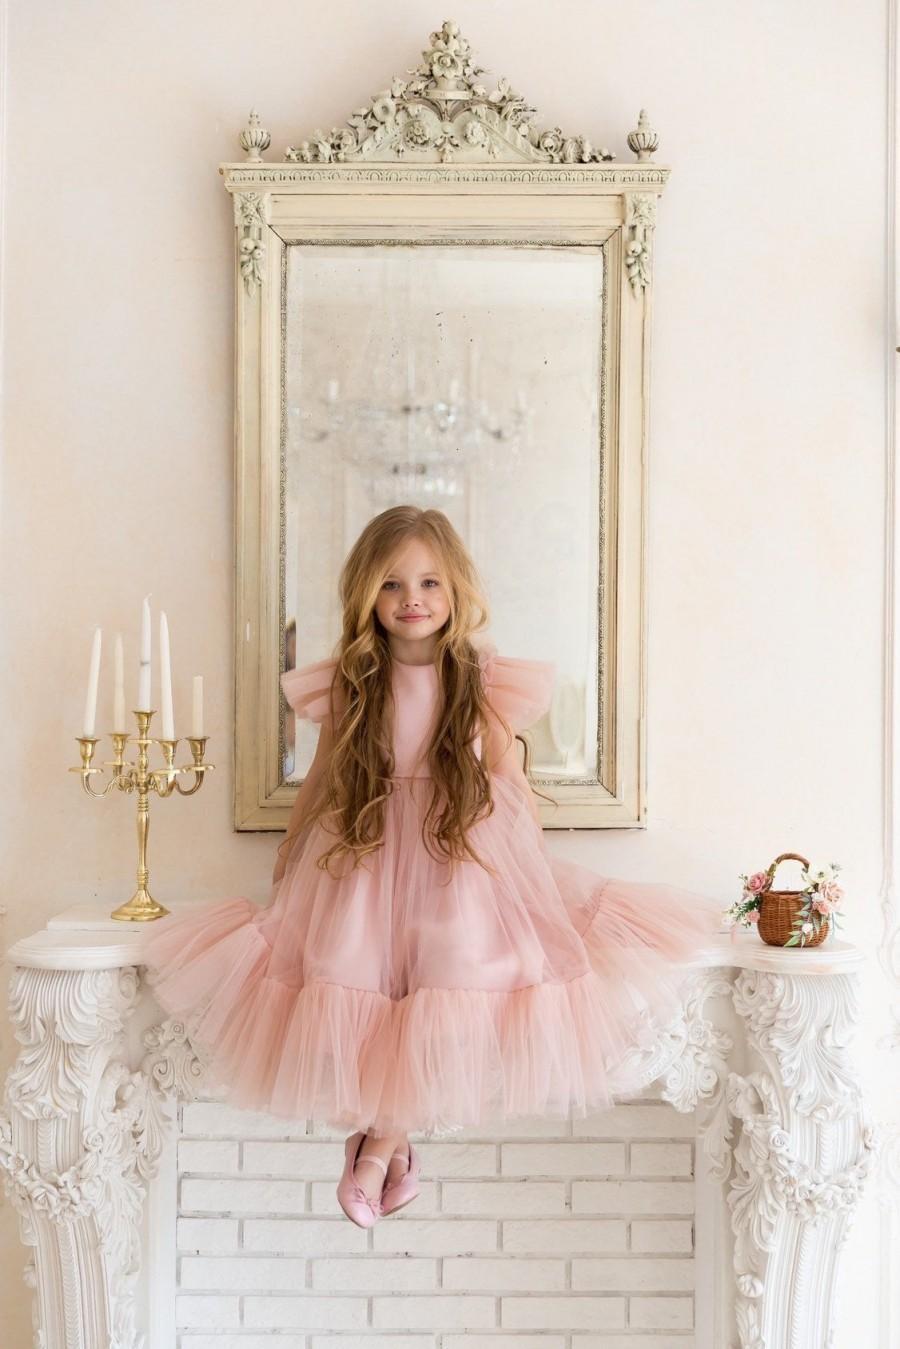 Hochzeit - Flower girl dress, Blush flower girl dress, flower girl dress tulle, flower girl dress tulle blush, boho flower girl dress